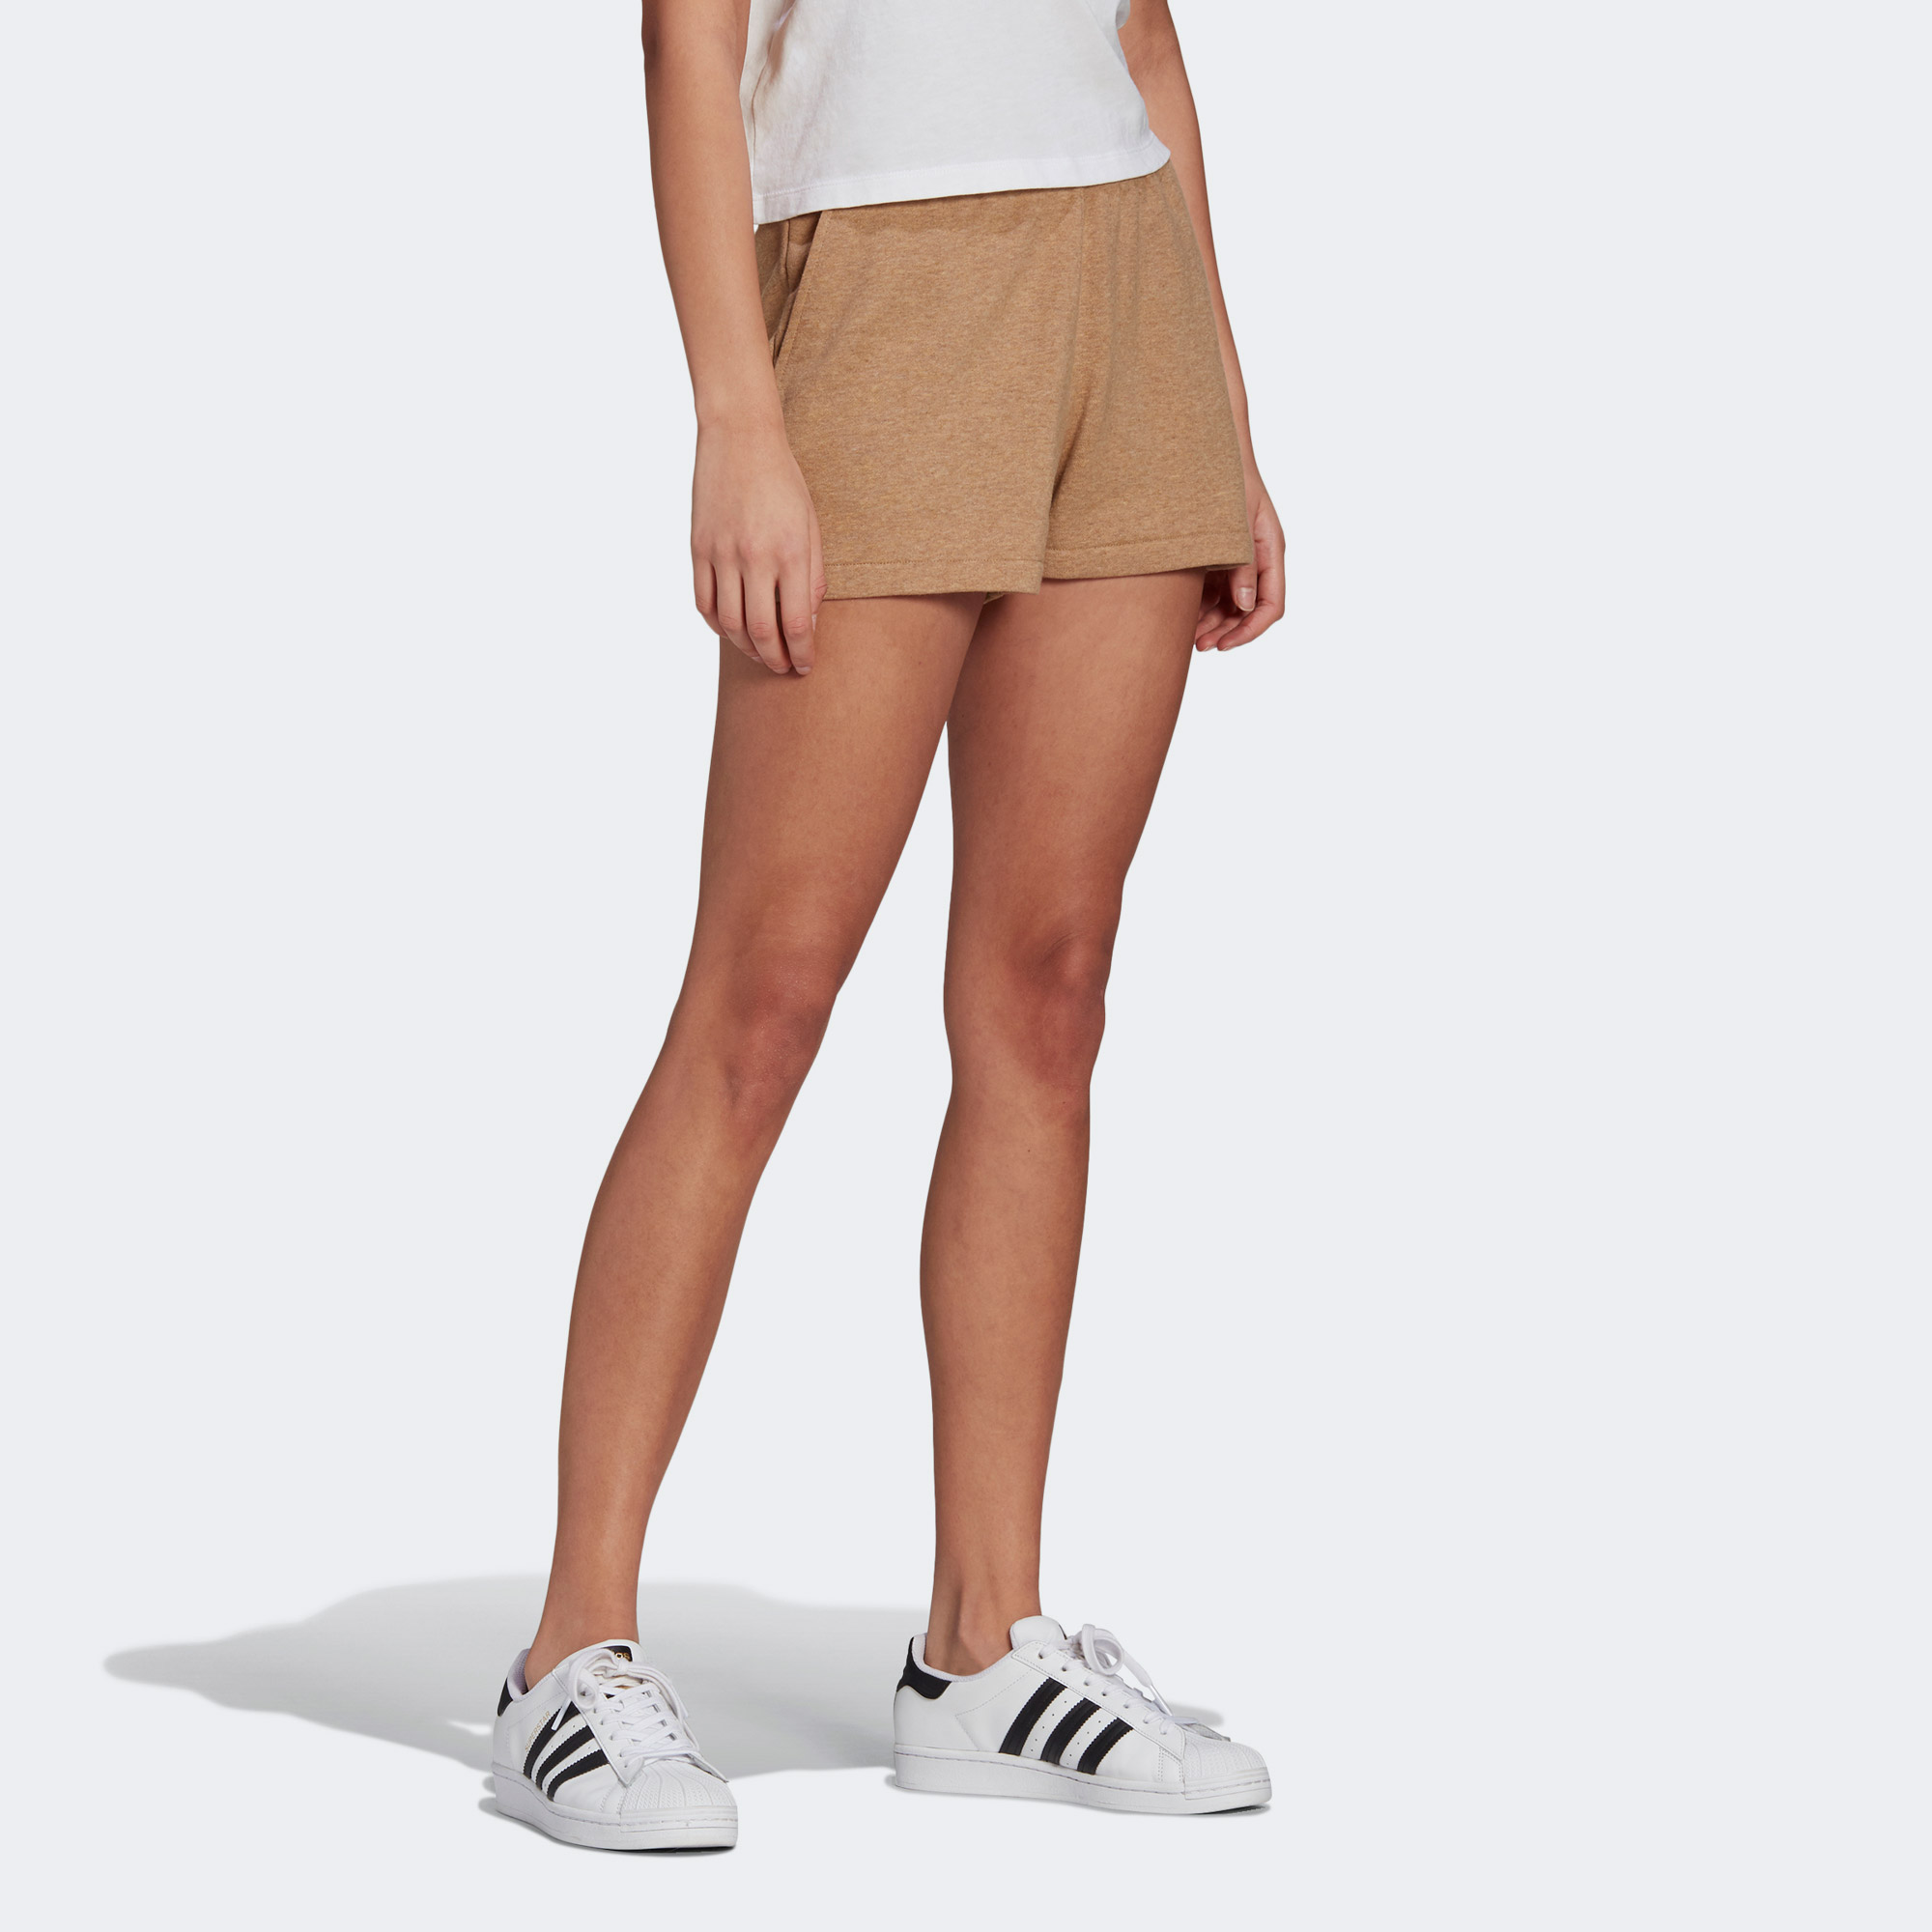 adidas R.Y.V Kadın Kahverengi Şort